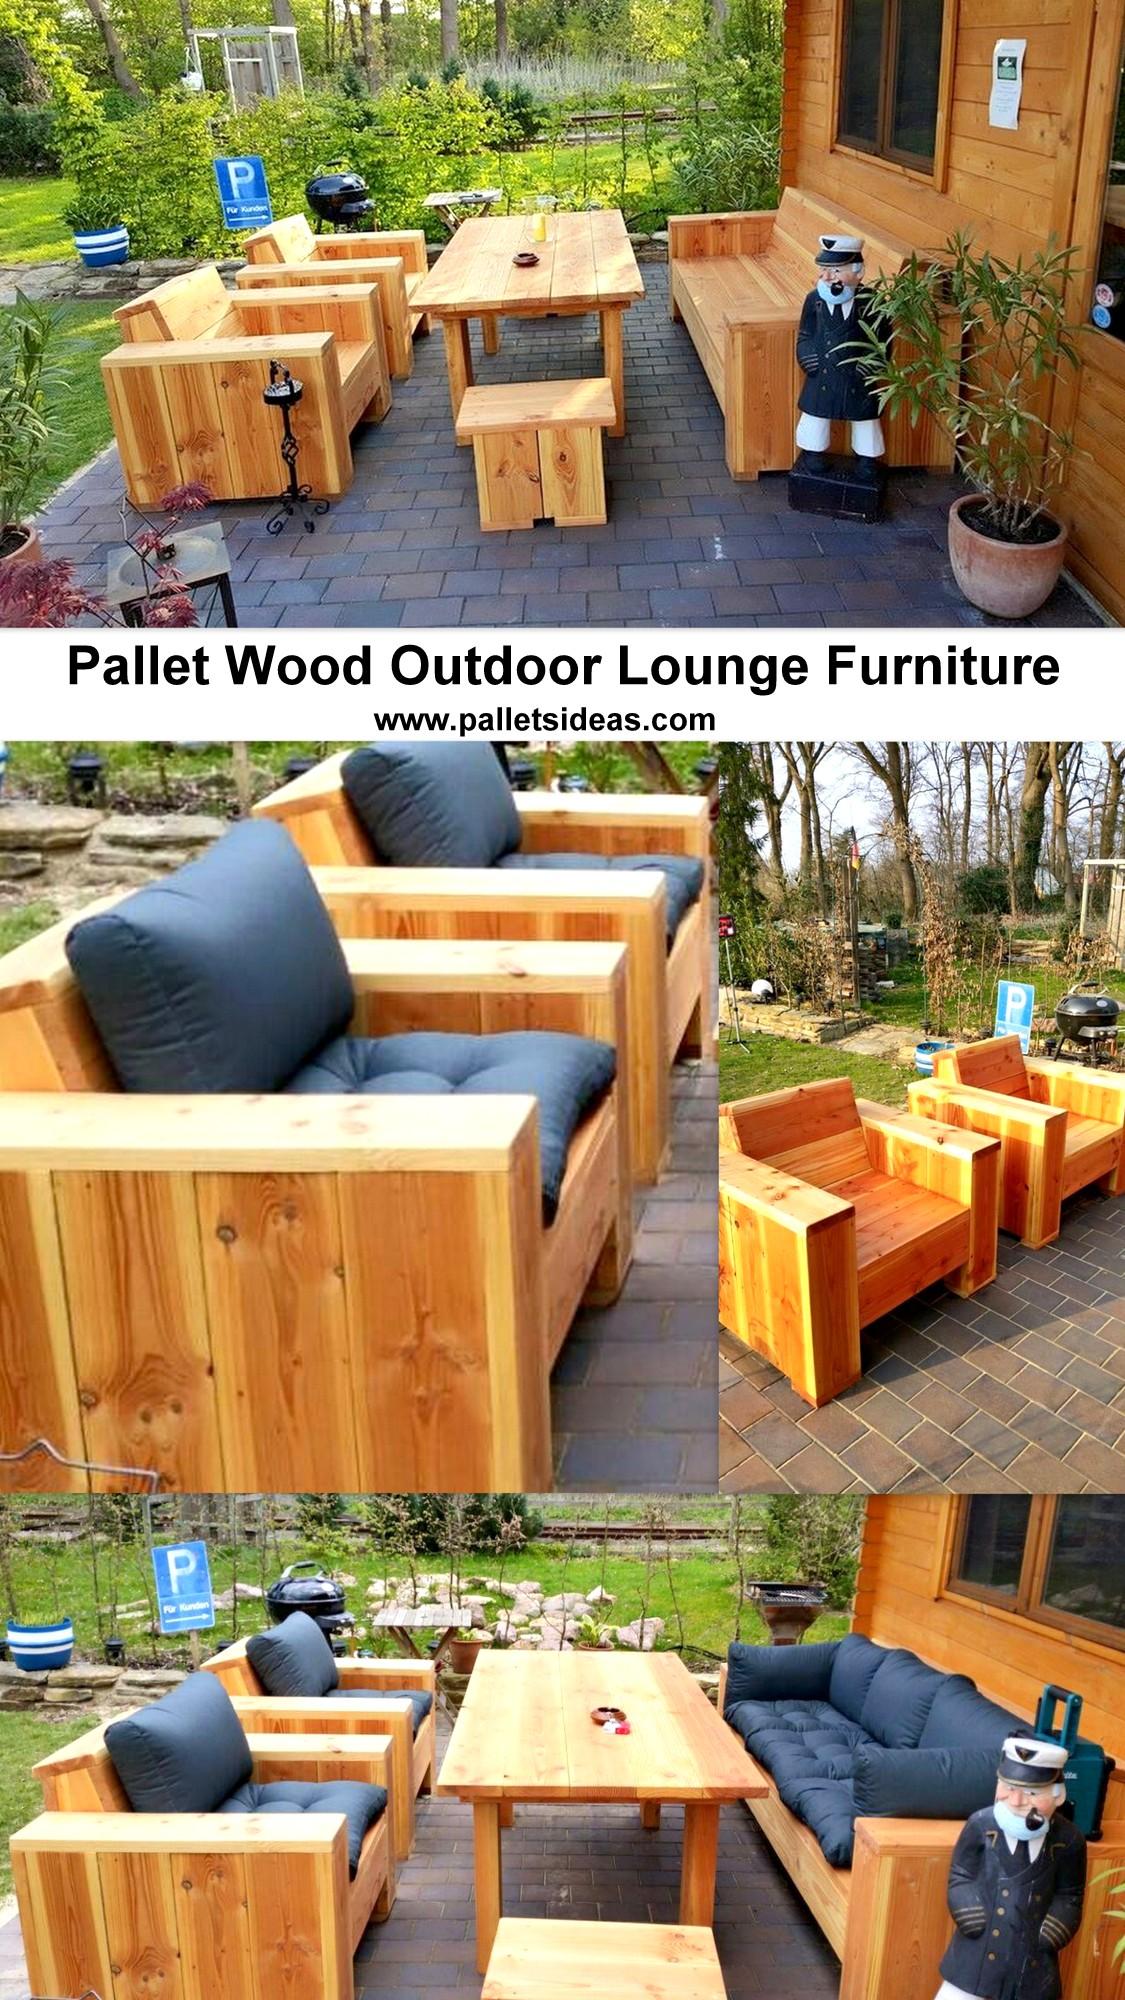 Pallet Wood Outdoor Lounge Furniture   Pallet Ideas on Backyard Lounge Area Ideas id=28394